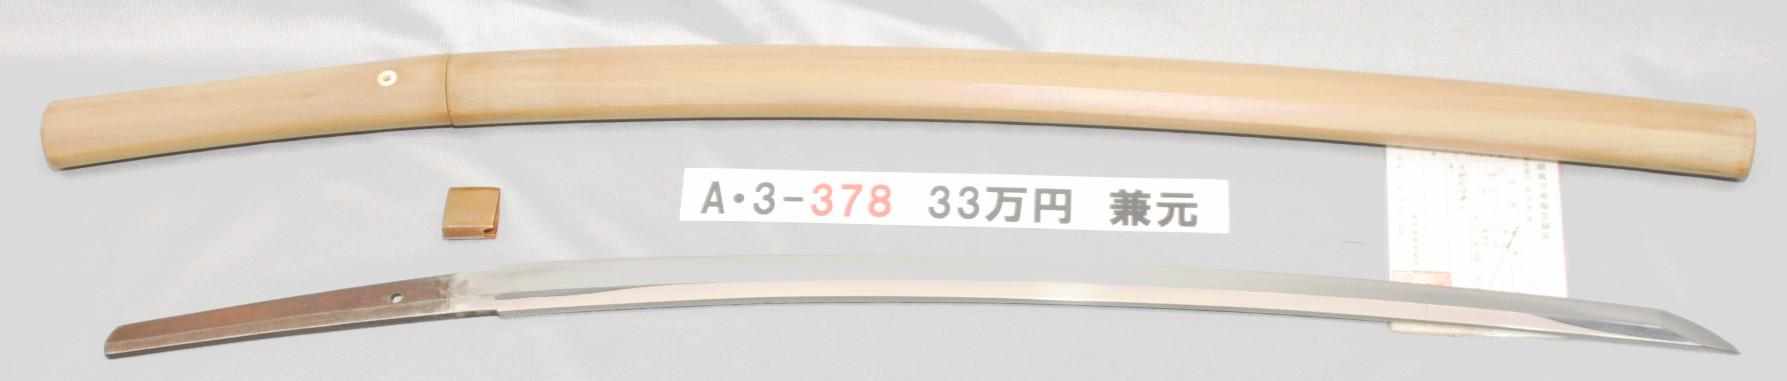 A3378